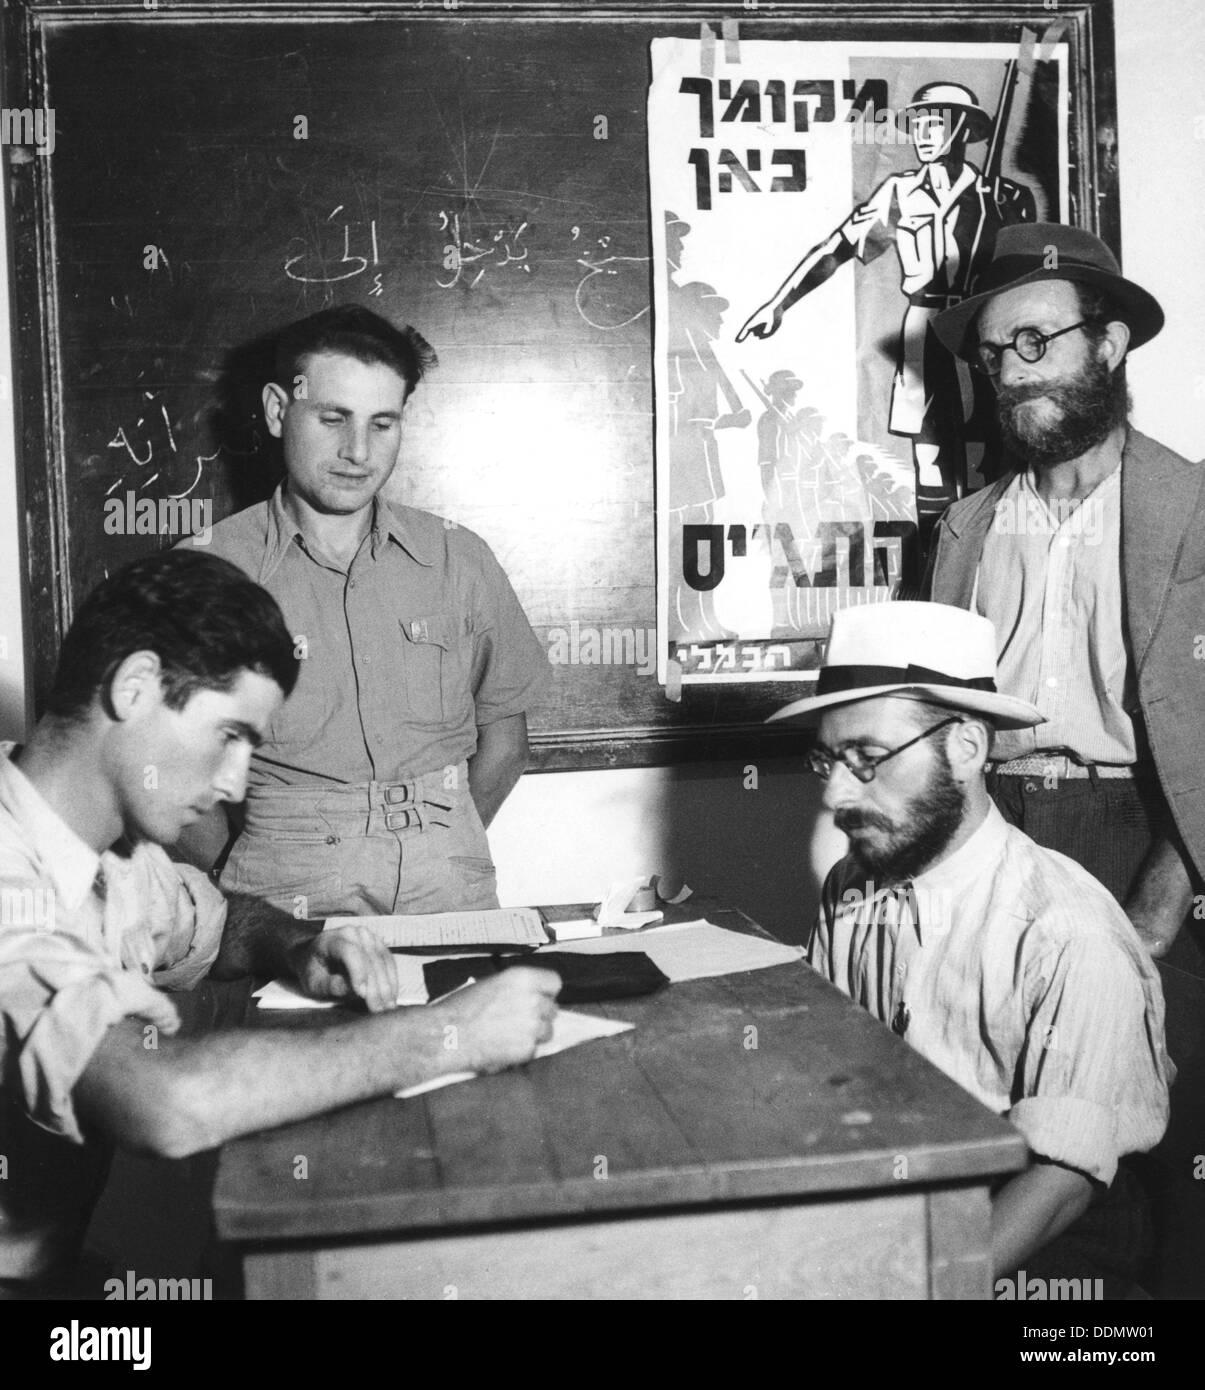 Jewish volunteers for the British Army, Palestine, World War II, 1939-1945. - Stock Image